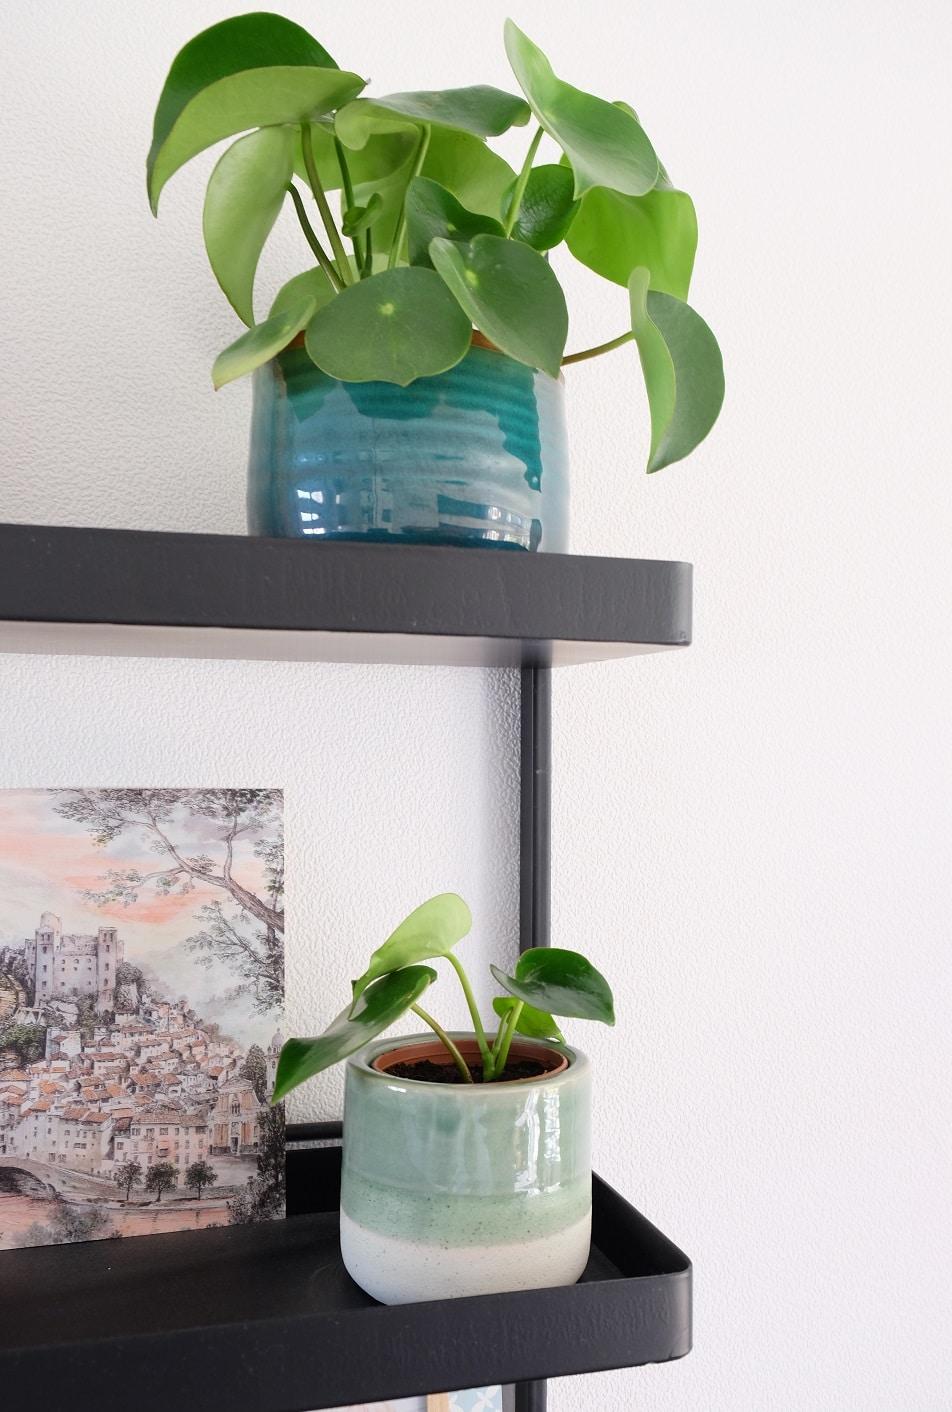 hippe plant